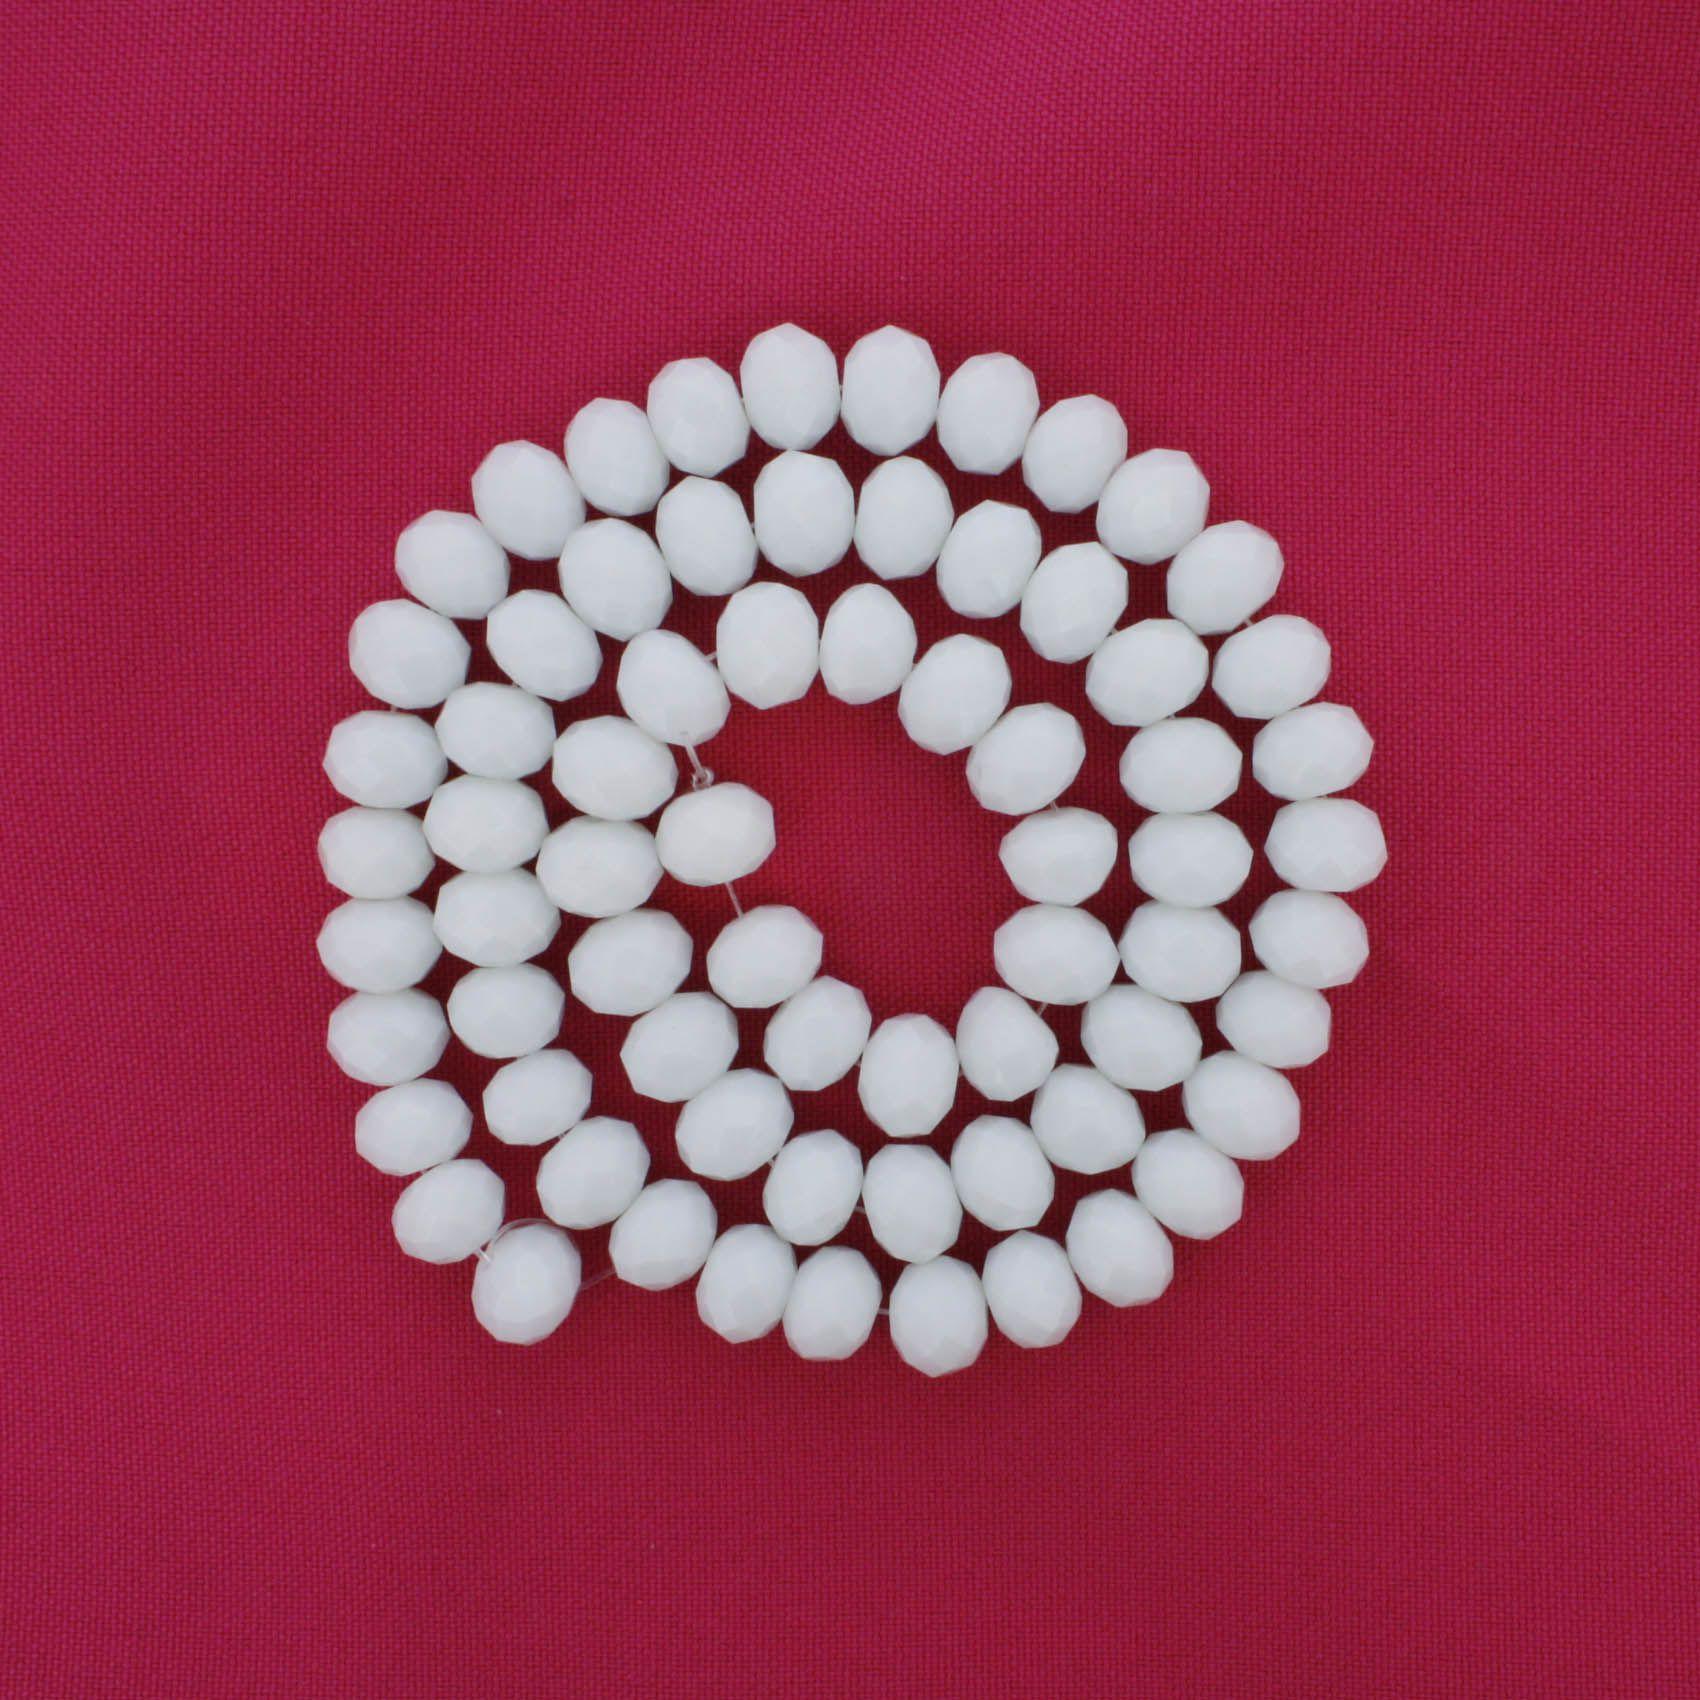 Fio de Cristal - Flat® - Branco - 10mm  - Stéphanie Bijoux® - Peças para Bijuterias e Artesanato